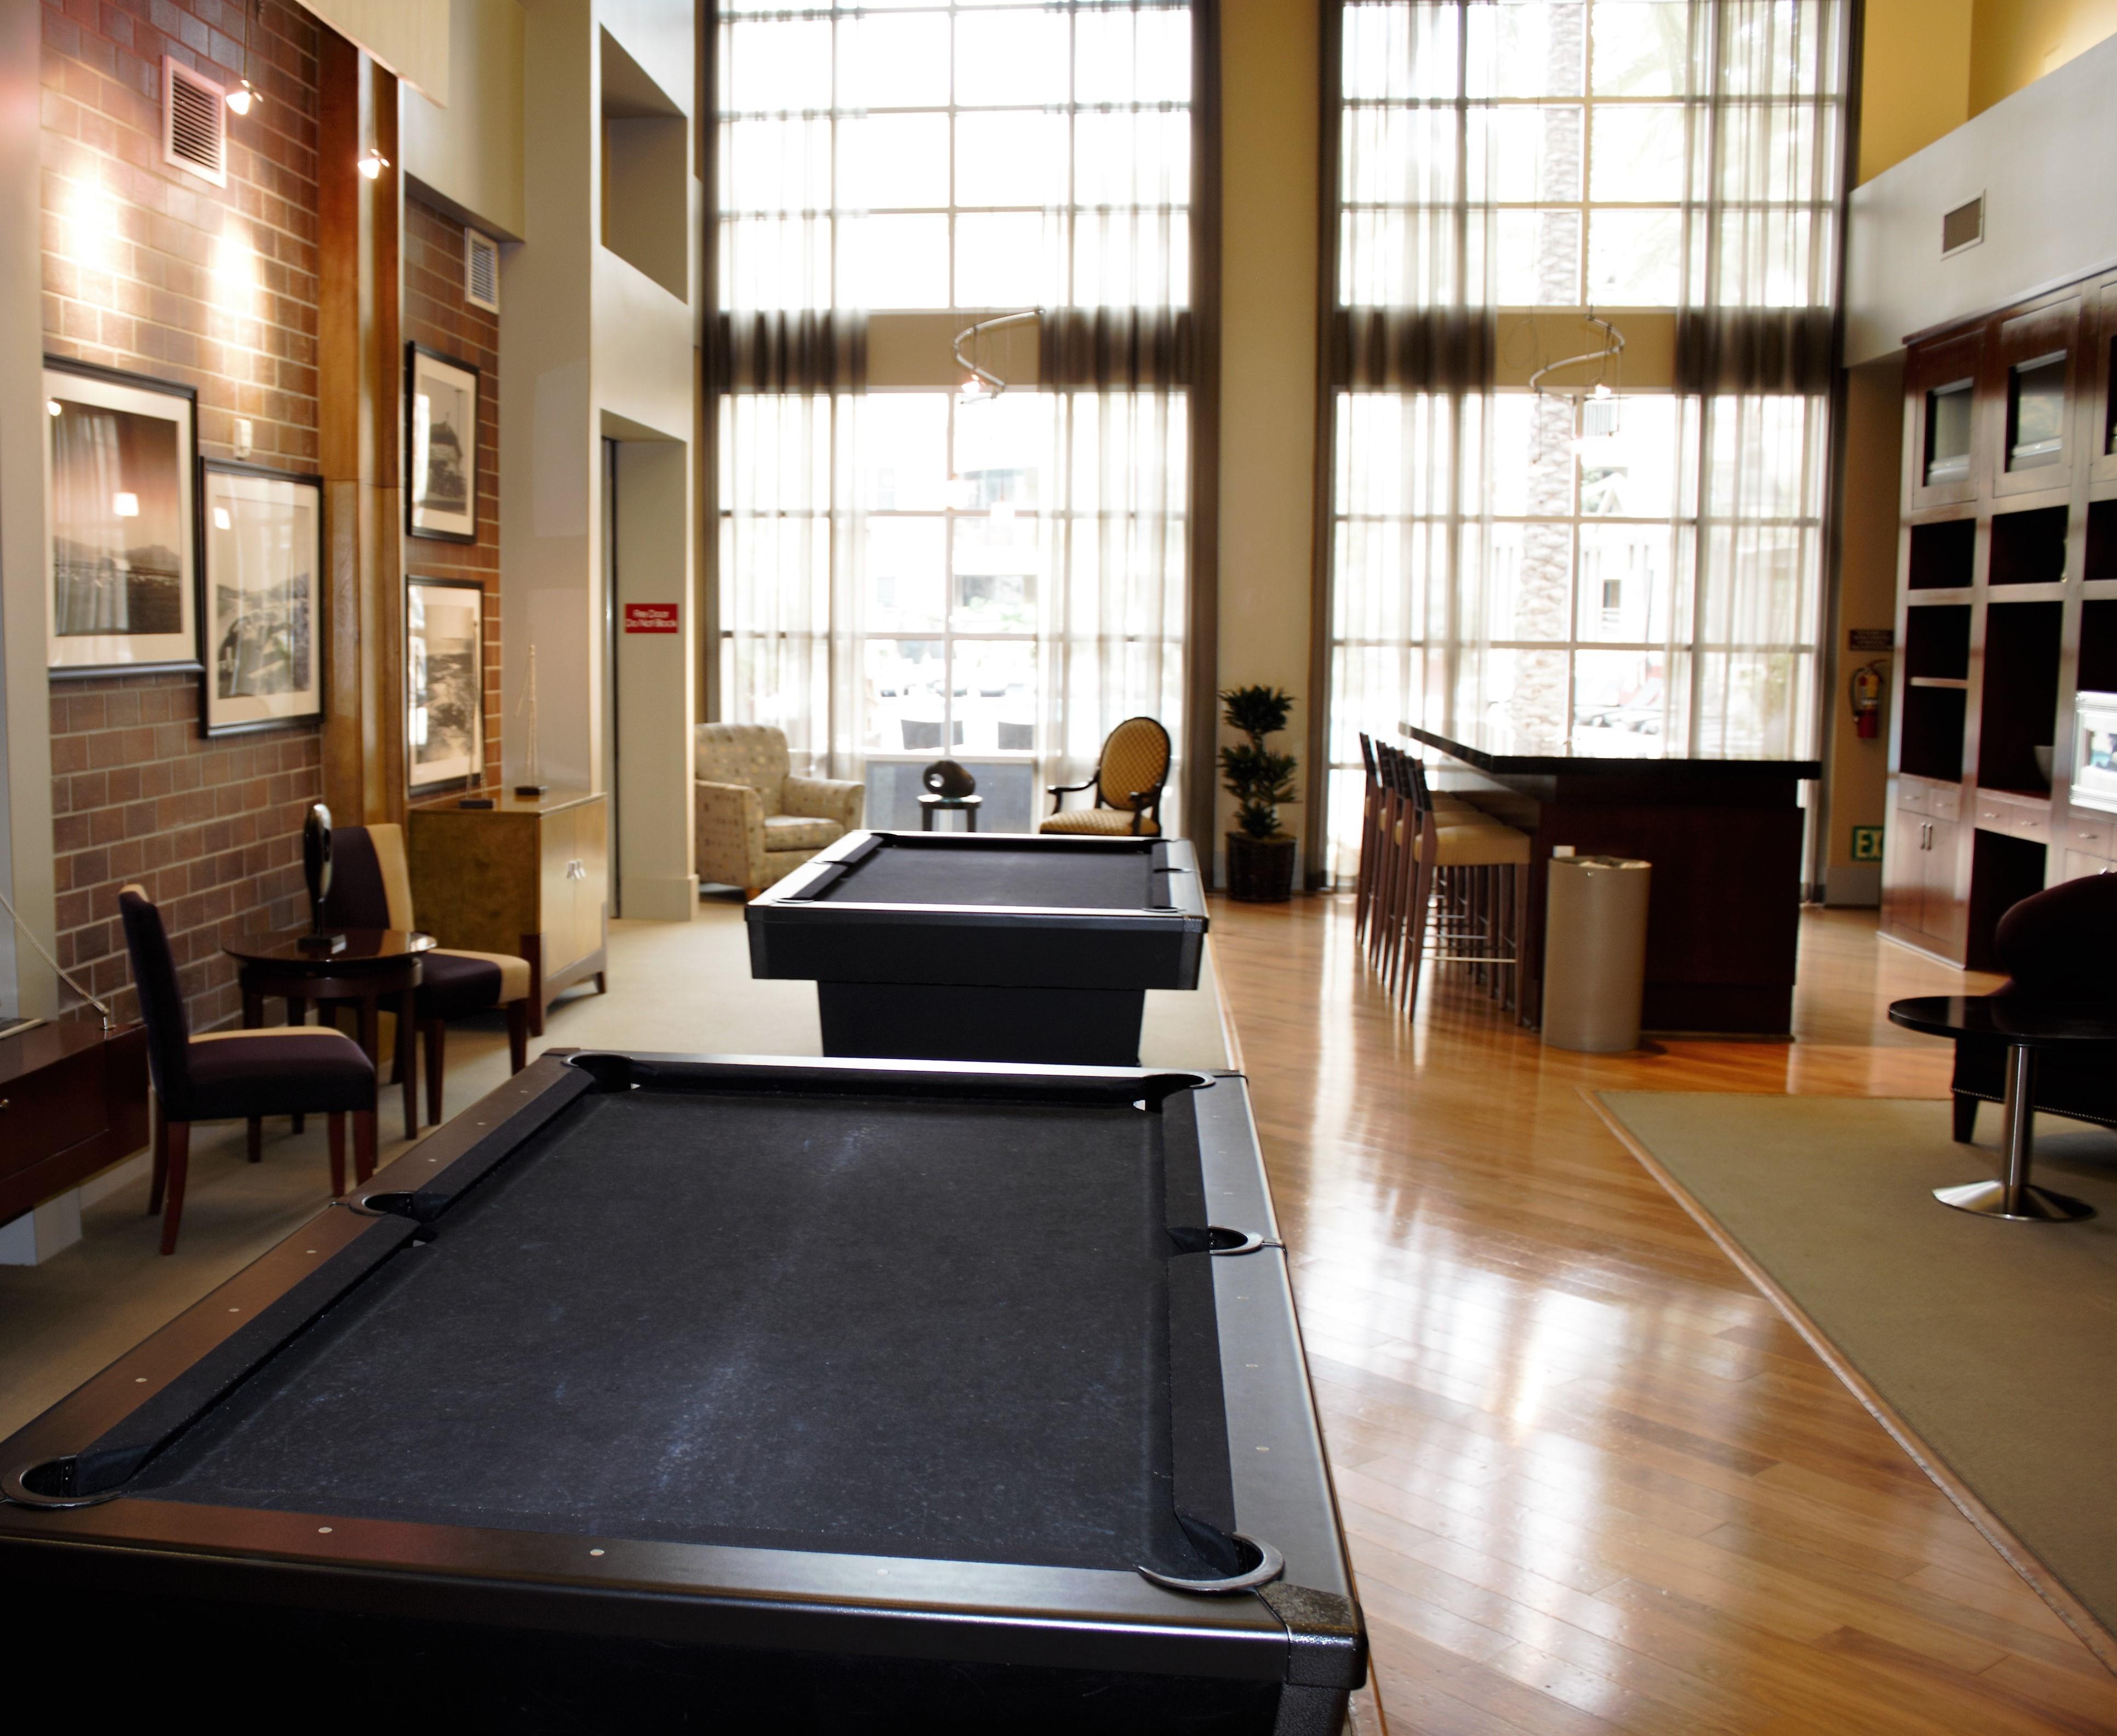 Billiards in Community Room